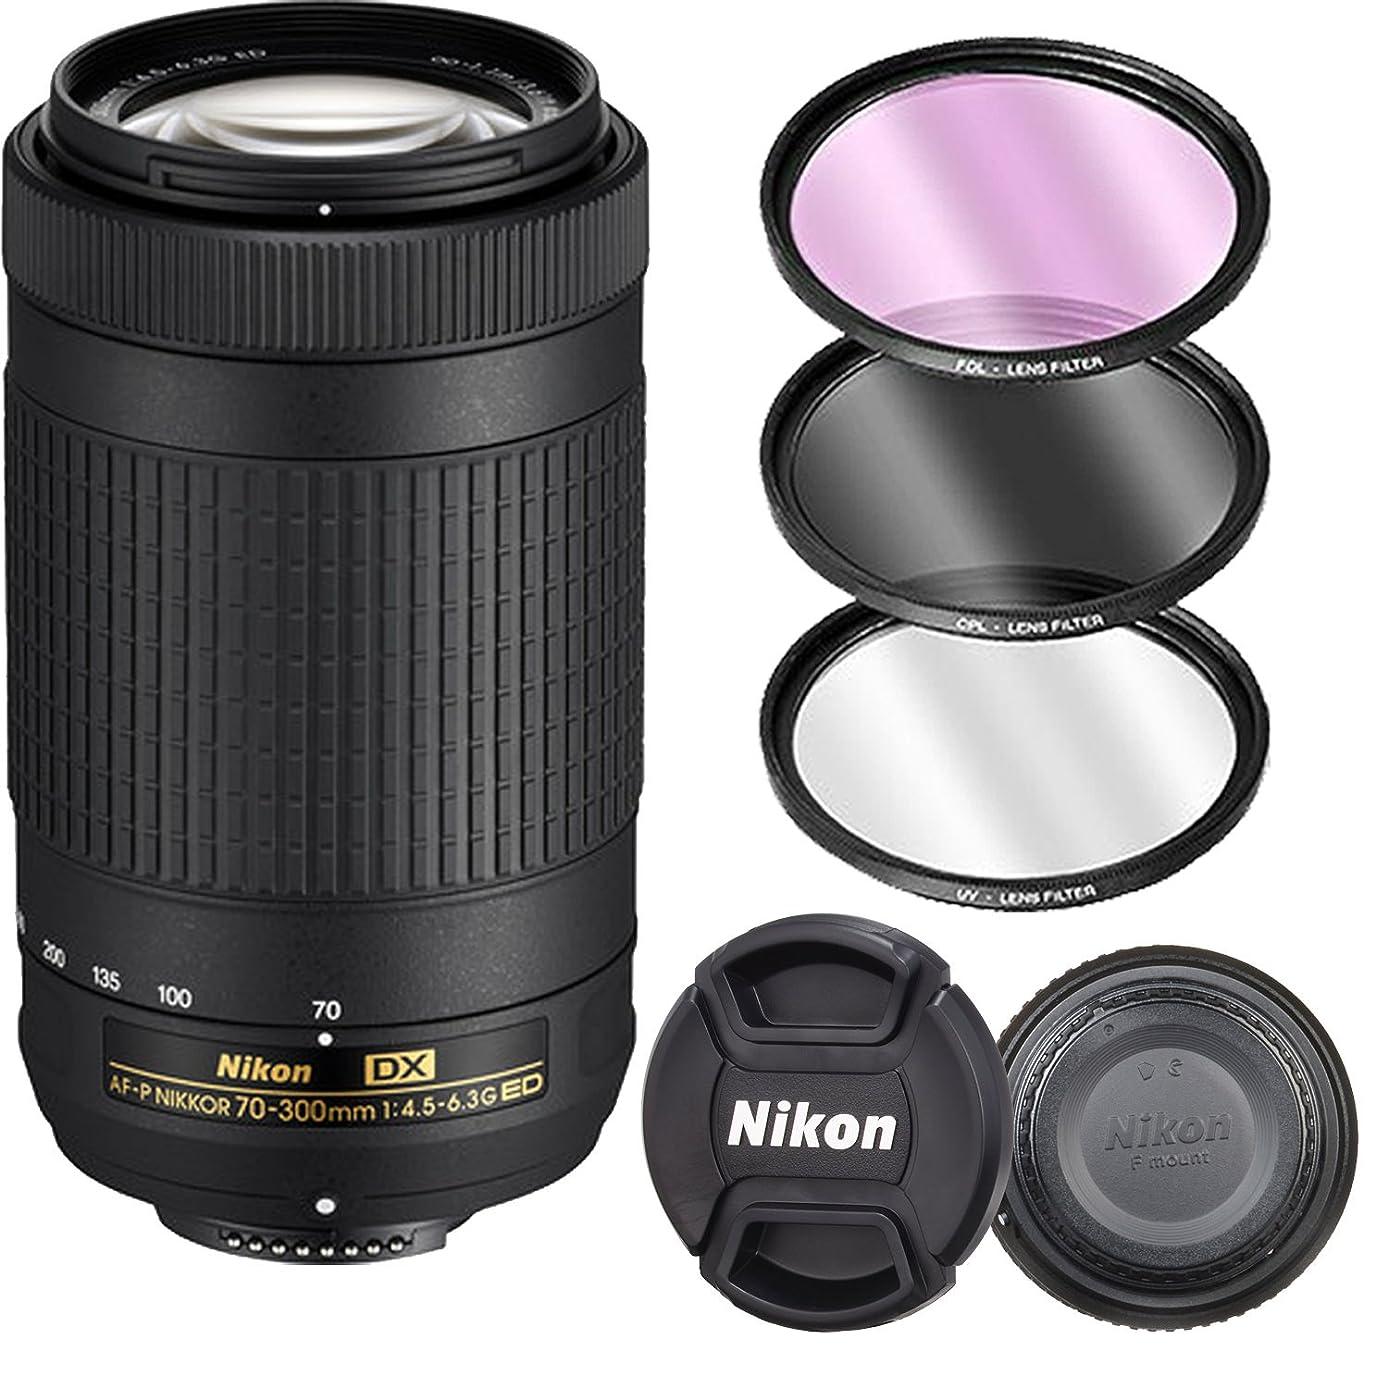 Nikon AF-P DX NIKKOR 70-300mm f/4.5-6.3G ED Zoom Lens for D3300, D3400, D5300, D5500, D5600, D7500, D500 Digital SLR Cameras ONLY with 3 Piece Filter Kit (White Box)